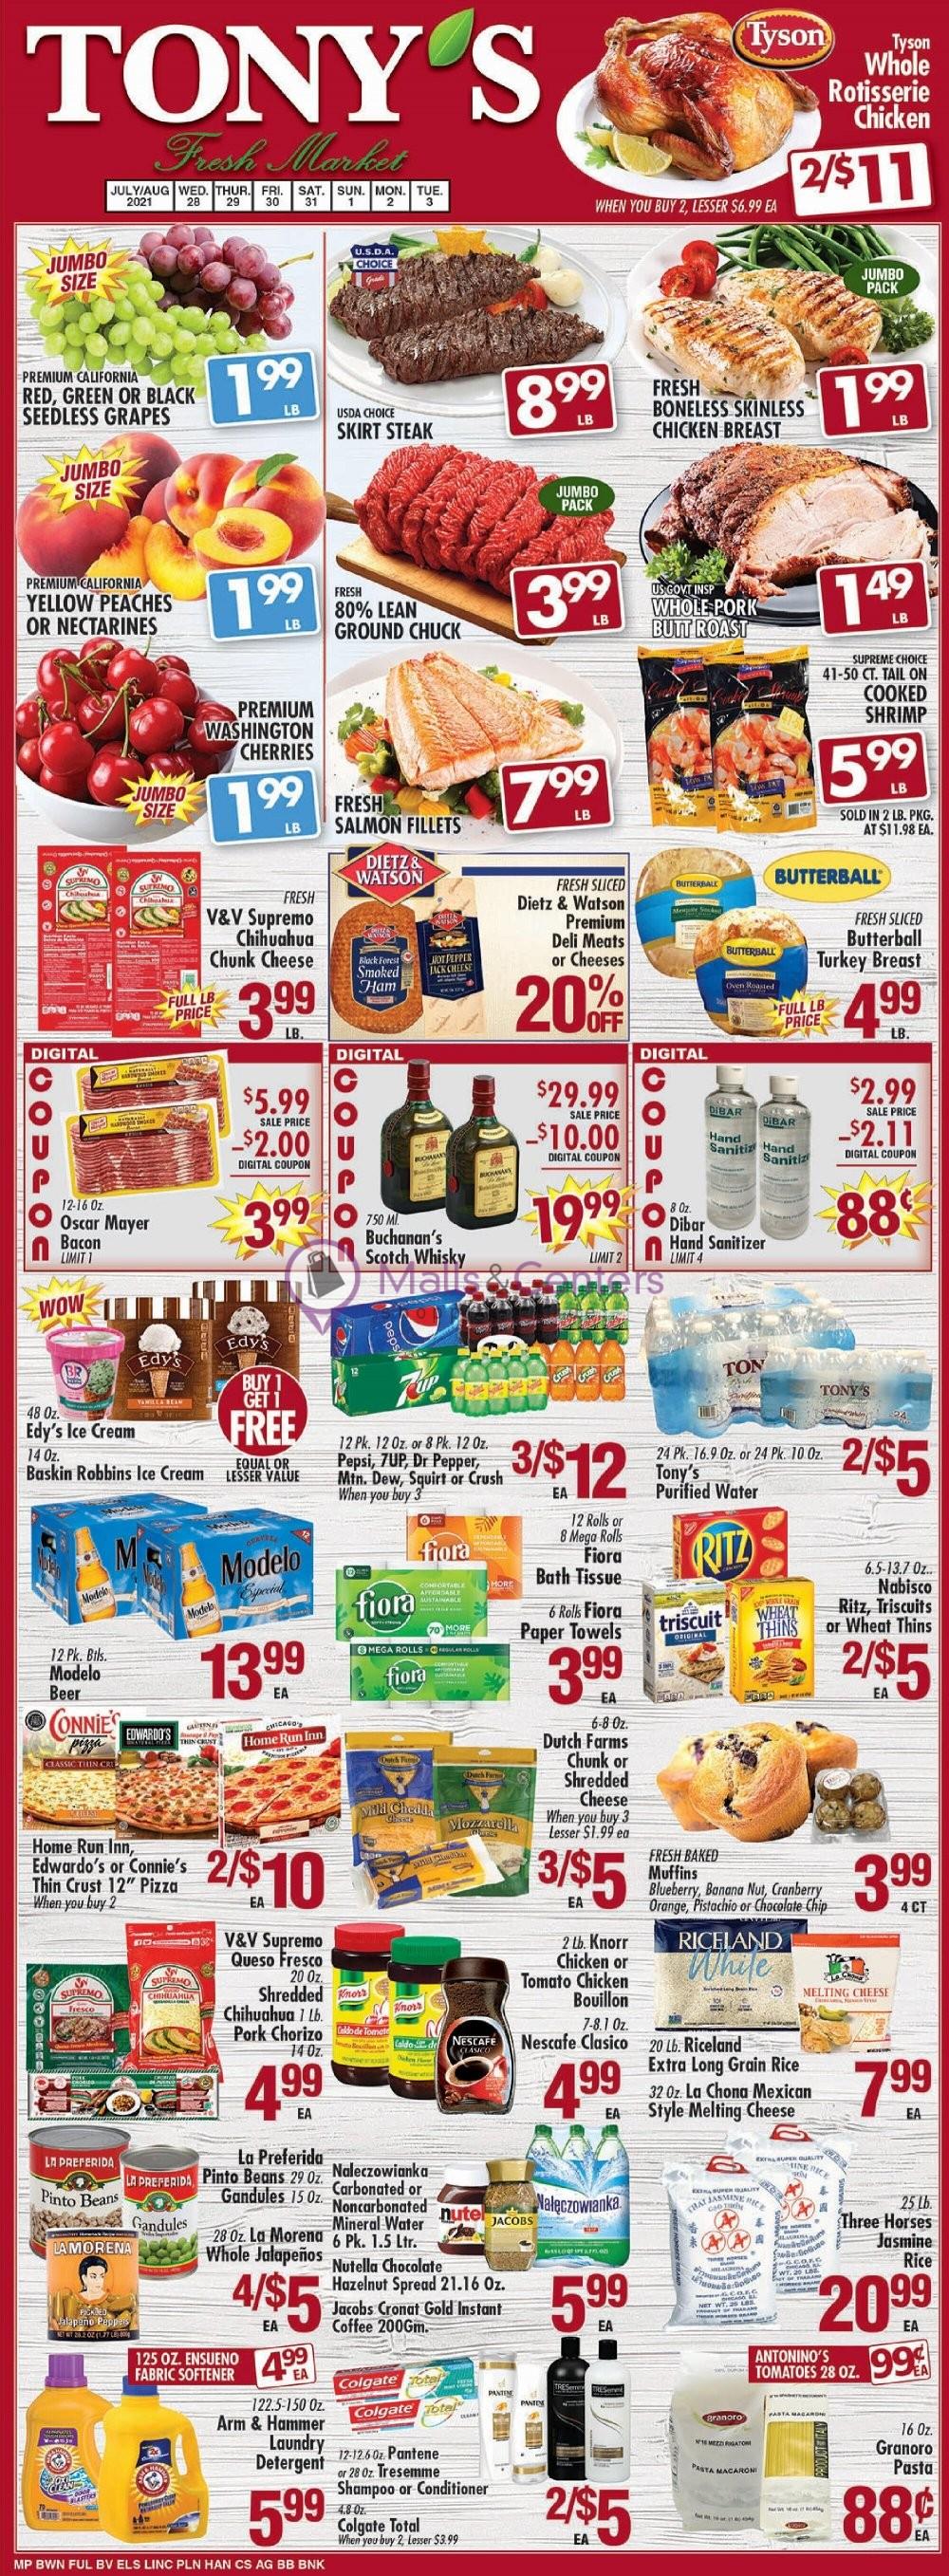 weekly ads Tony's Fresh Market - page 1 - mallscenters.com